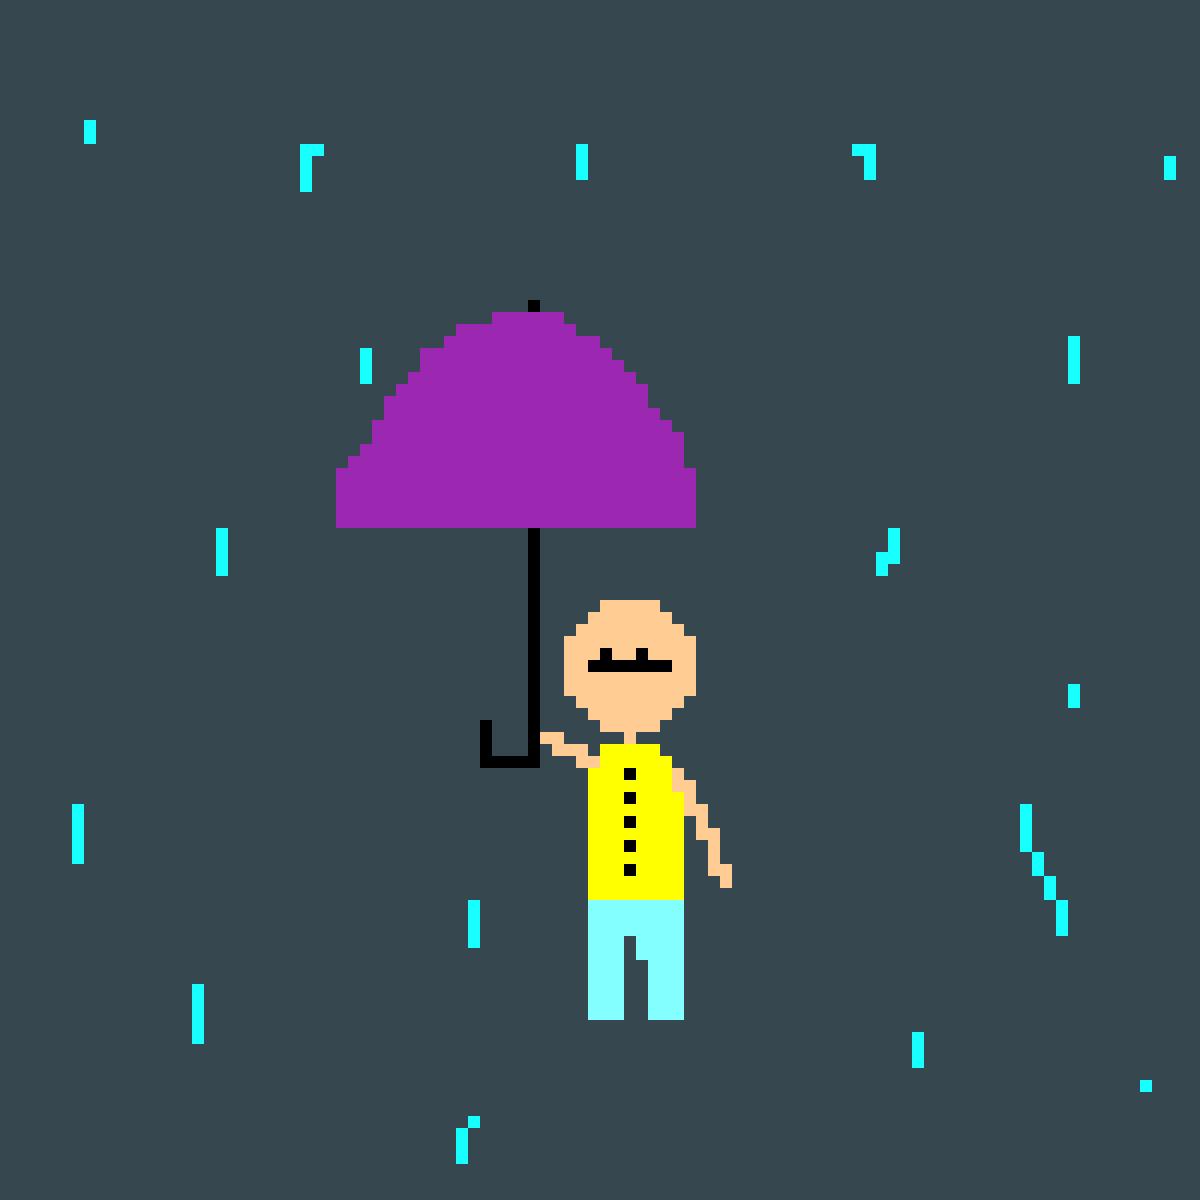 umbrella (remake) by Adhdforev22